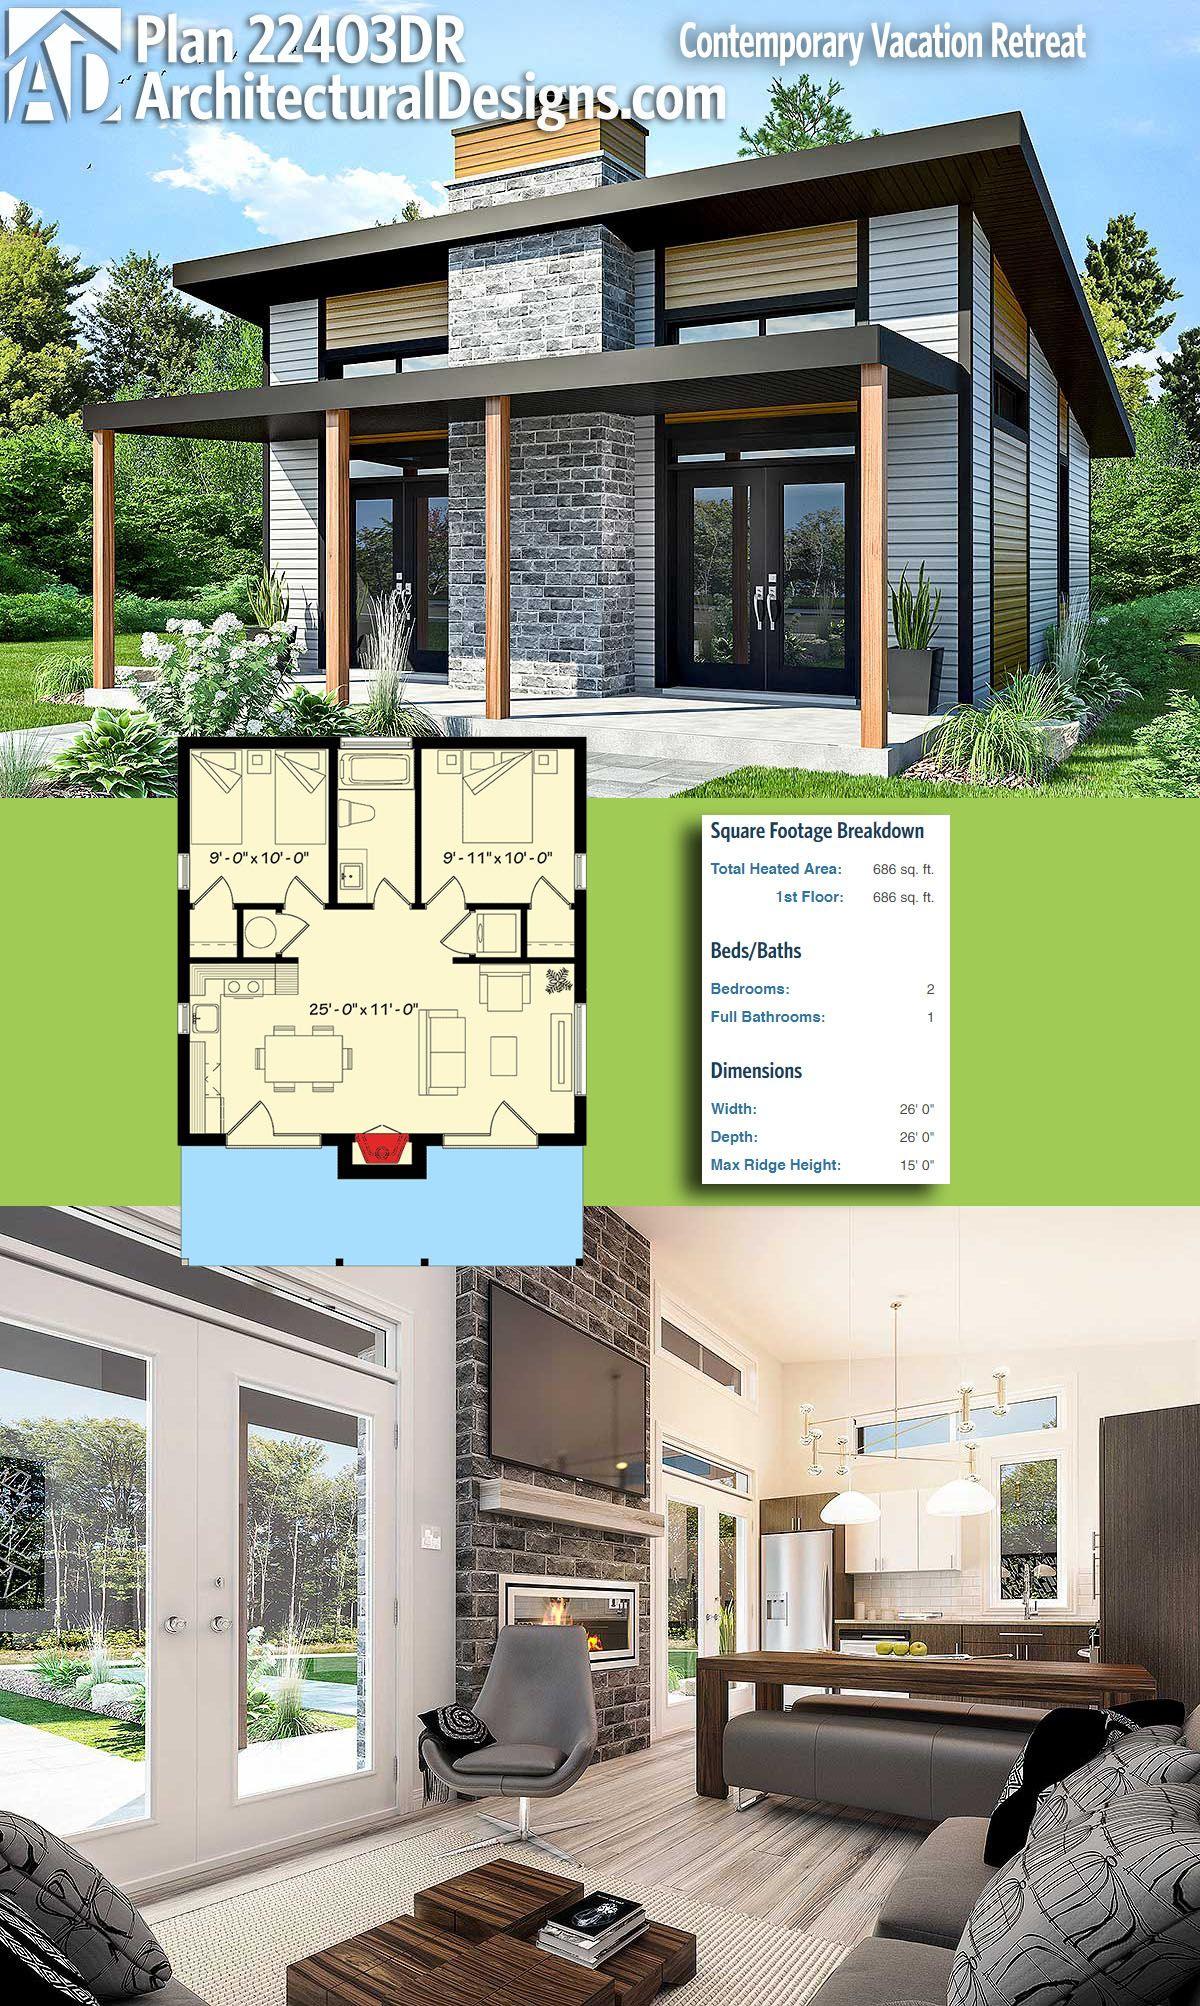 Plan 22403dr Contemporary Vacation Retreat Tiny House